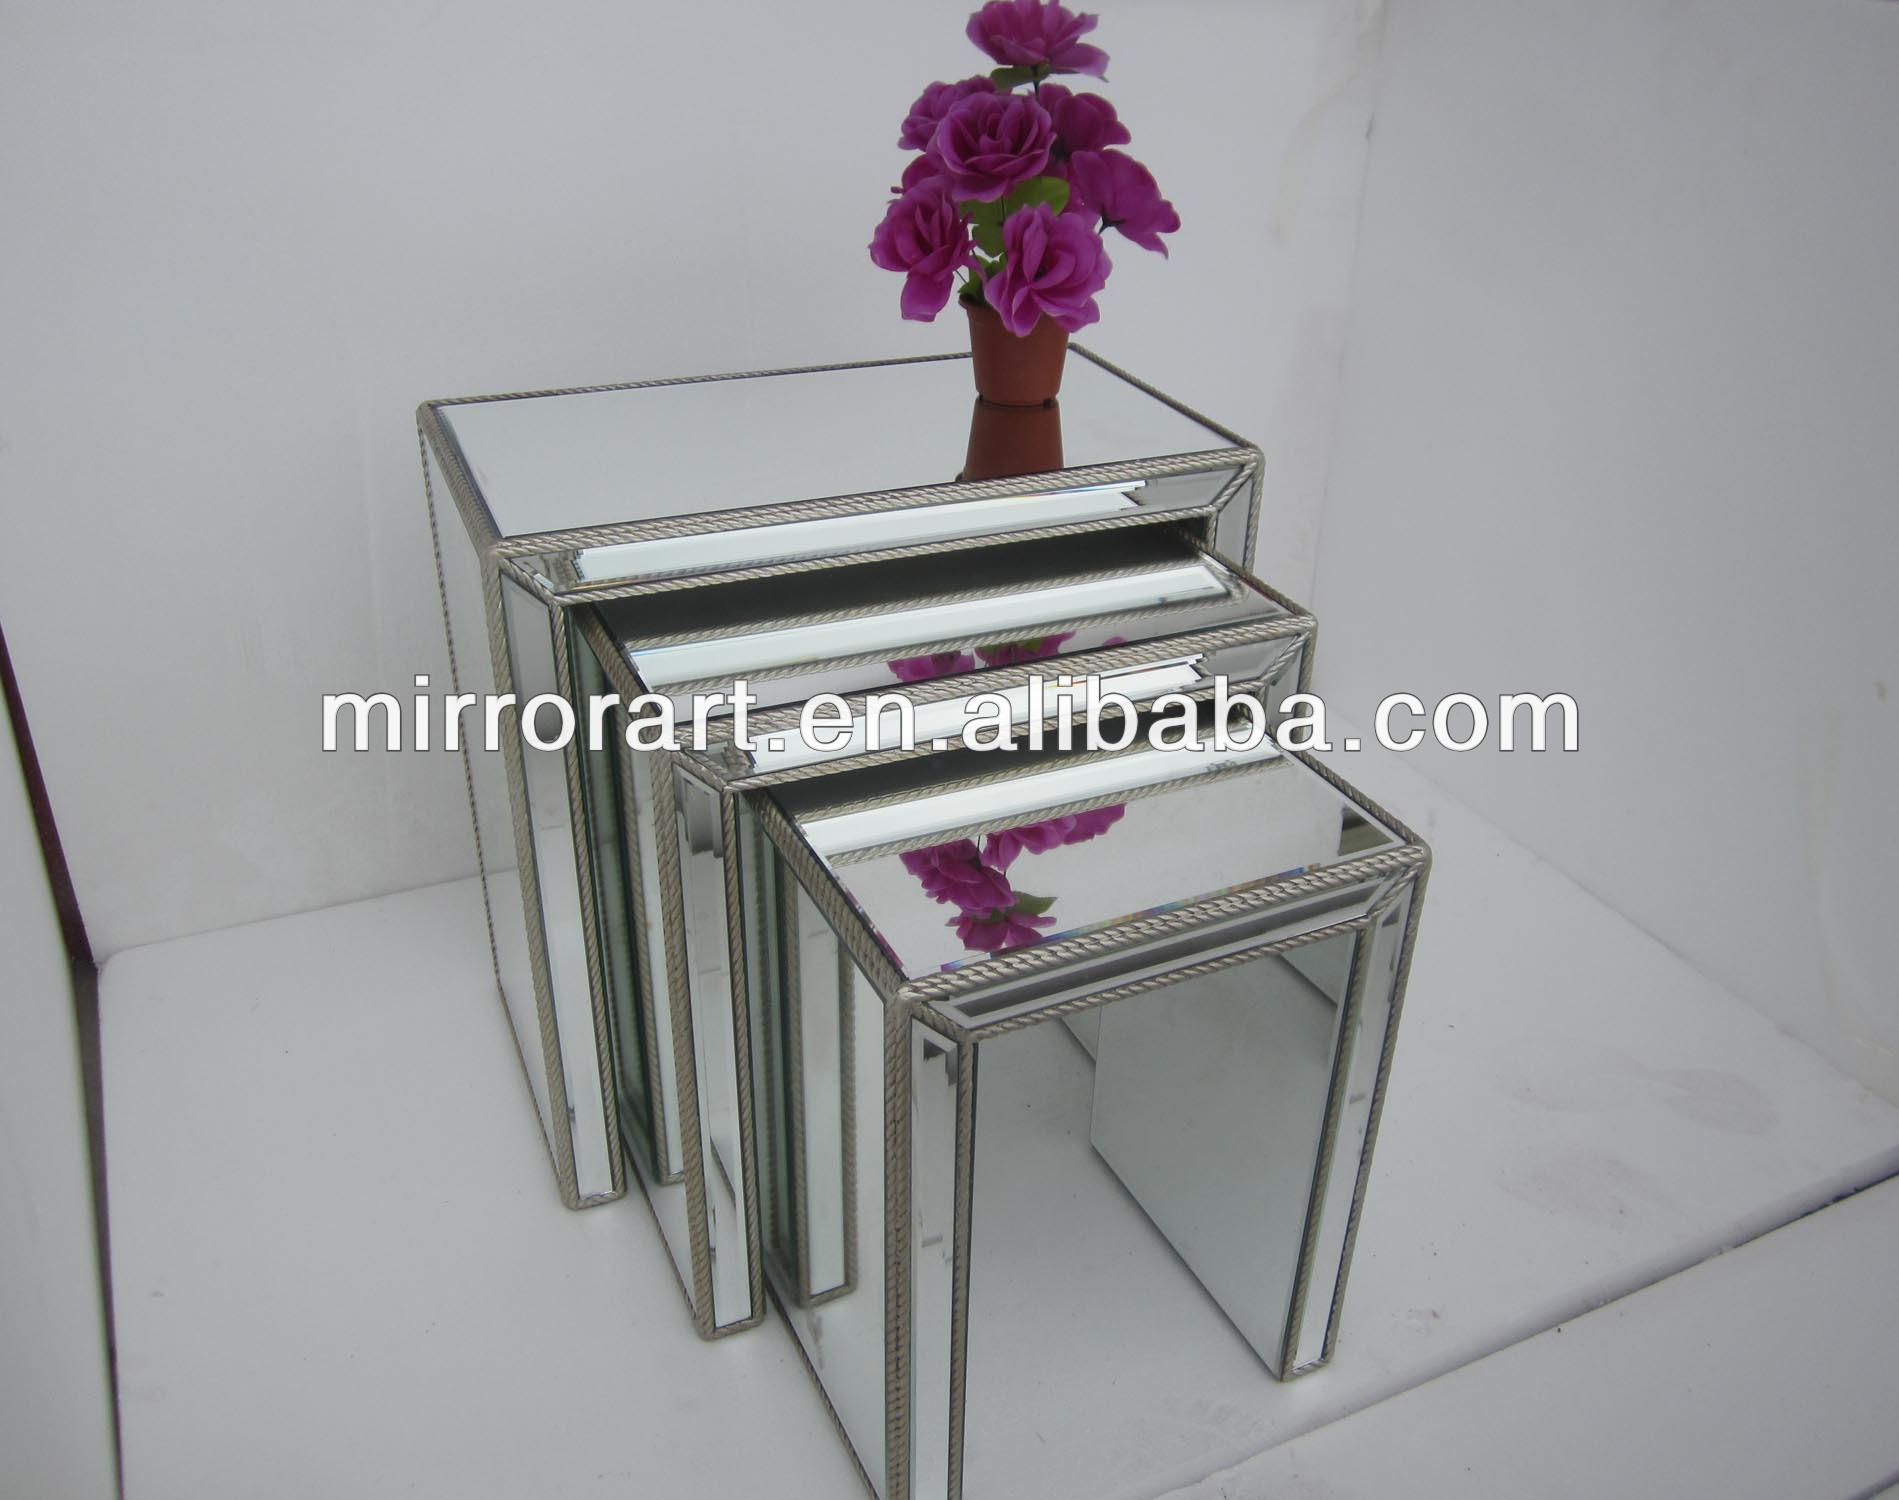 Mr 401307set vidrio espejo anidaci n tablas laterales con for Espejo con borde biselado